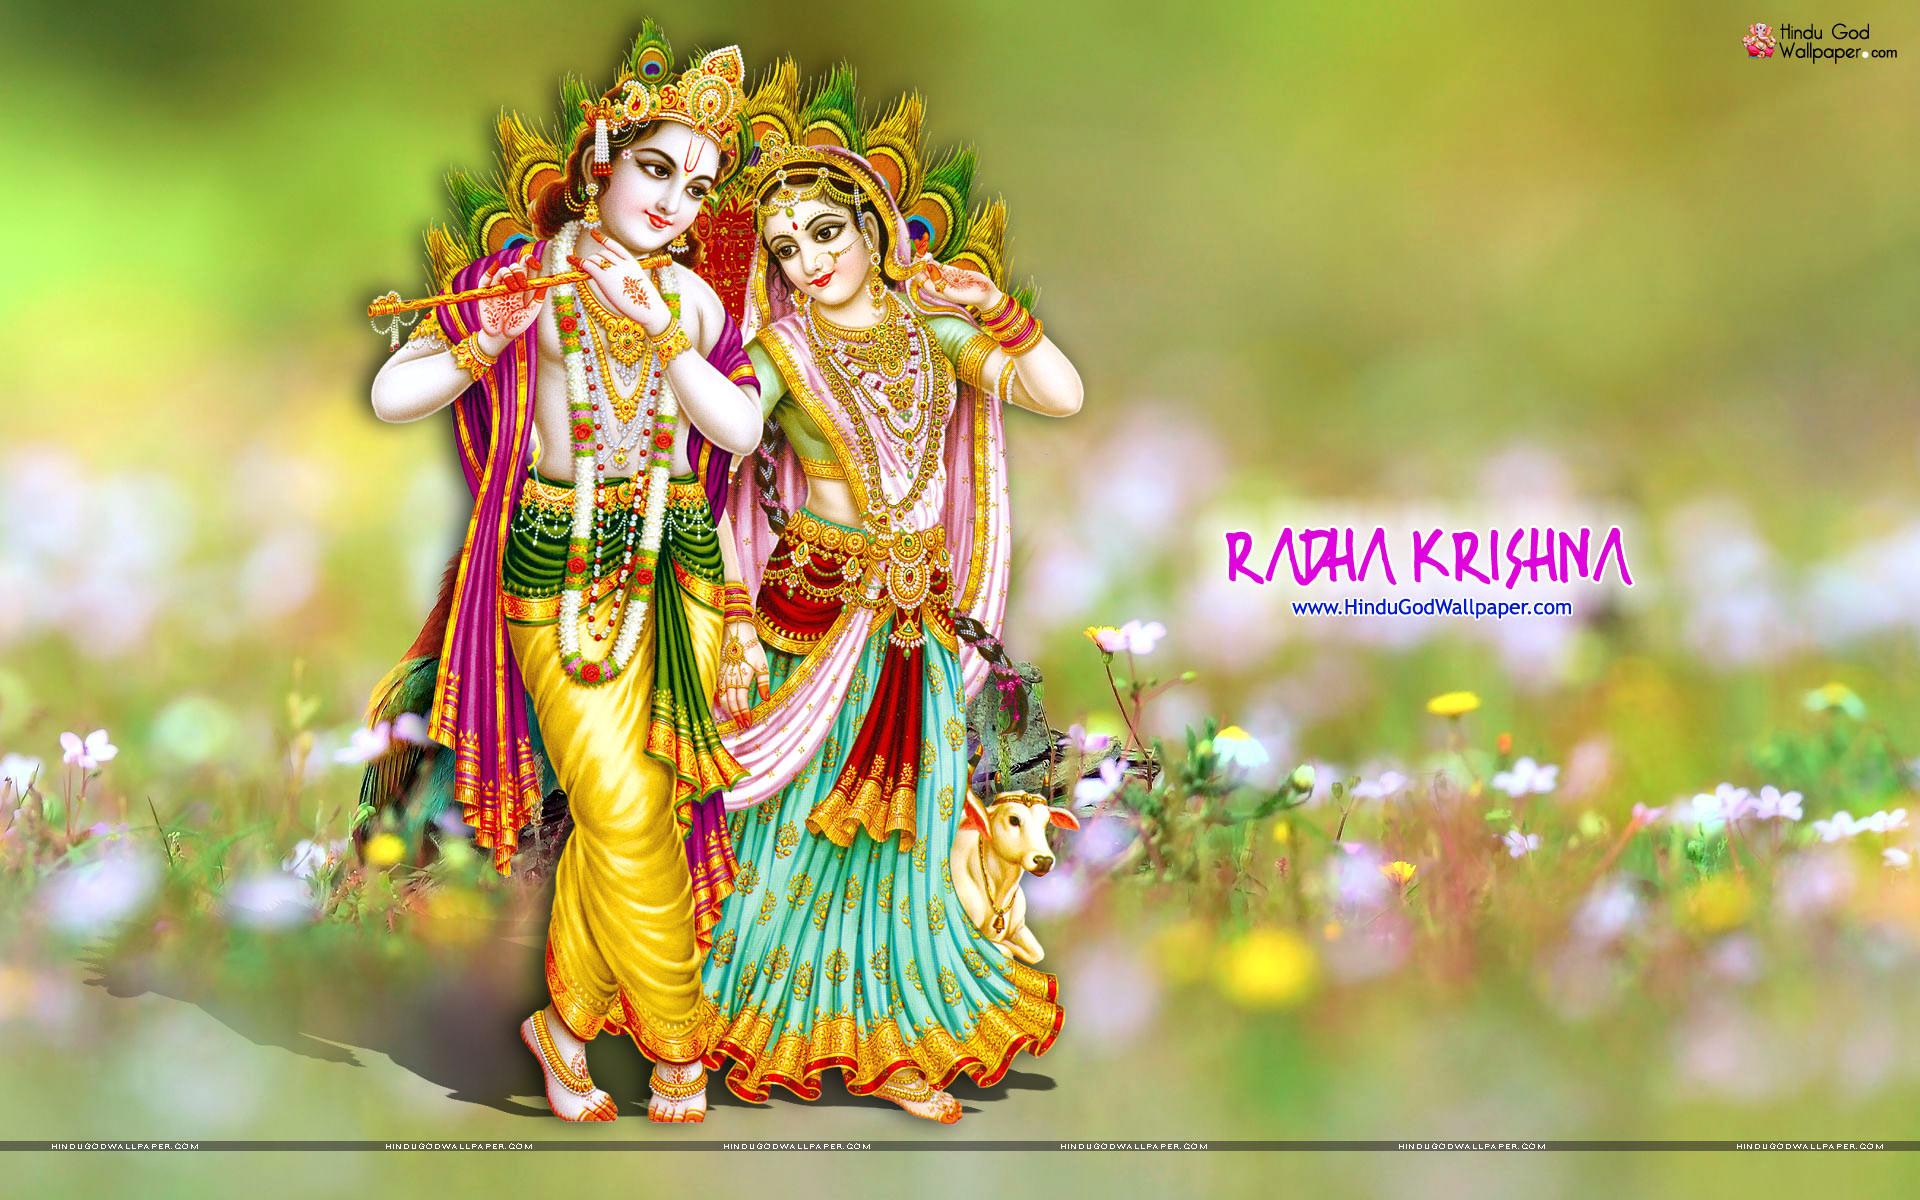 Sai Baba Animated Wallpaper For Mobile Hindu God Hd Wallpapers 1080p 68 Images